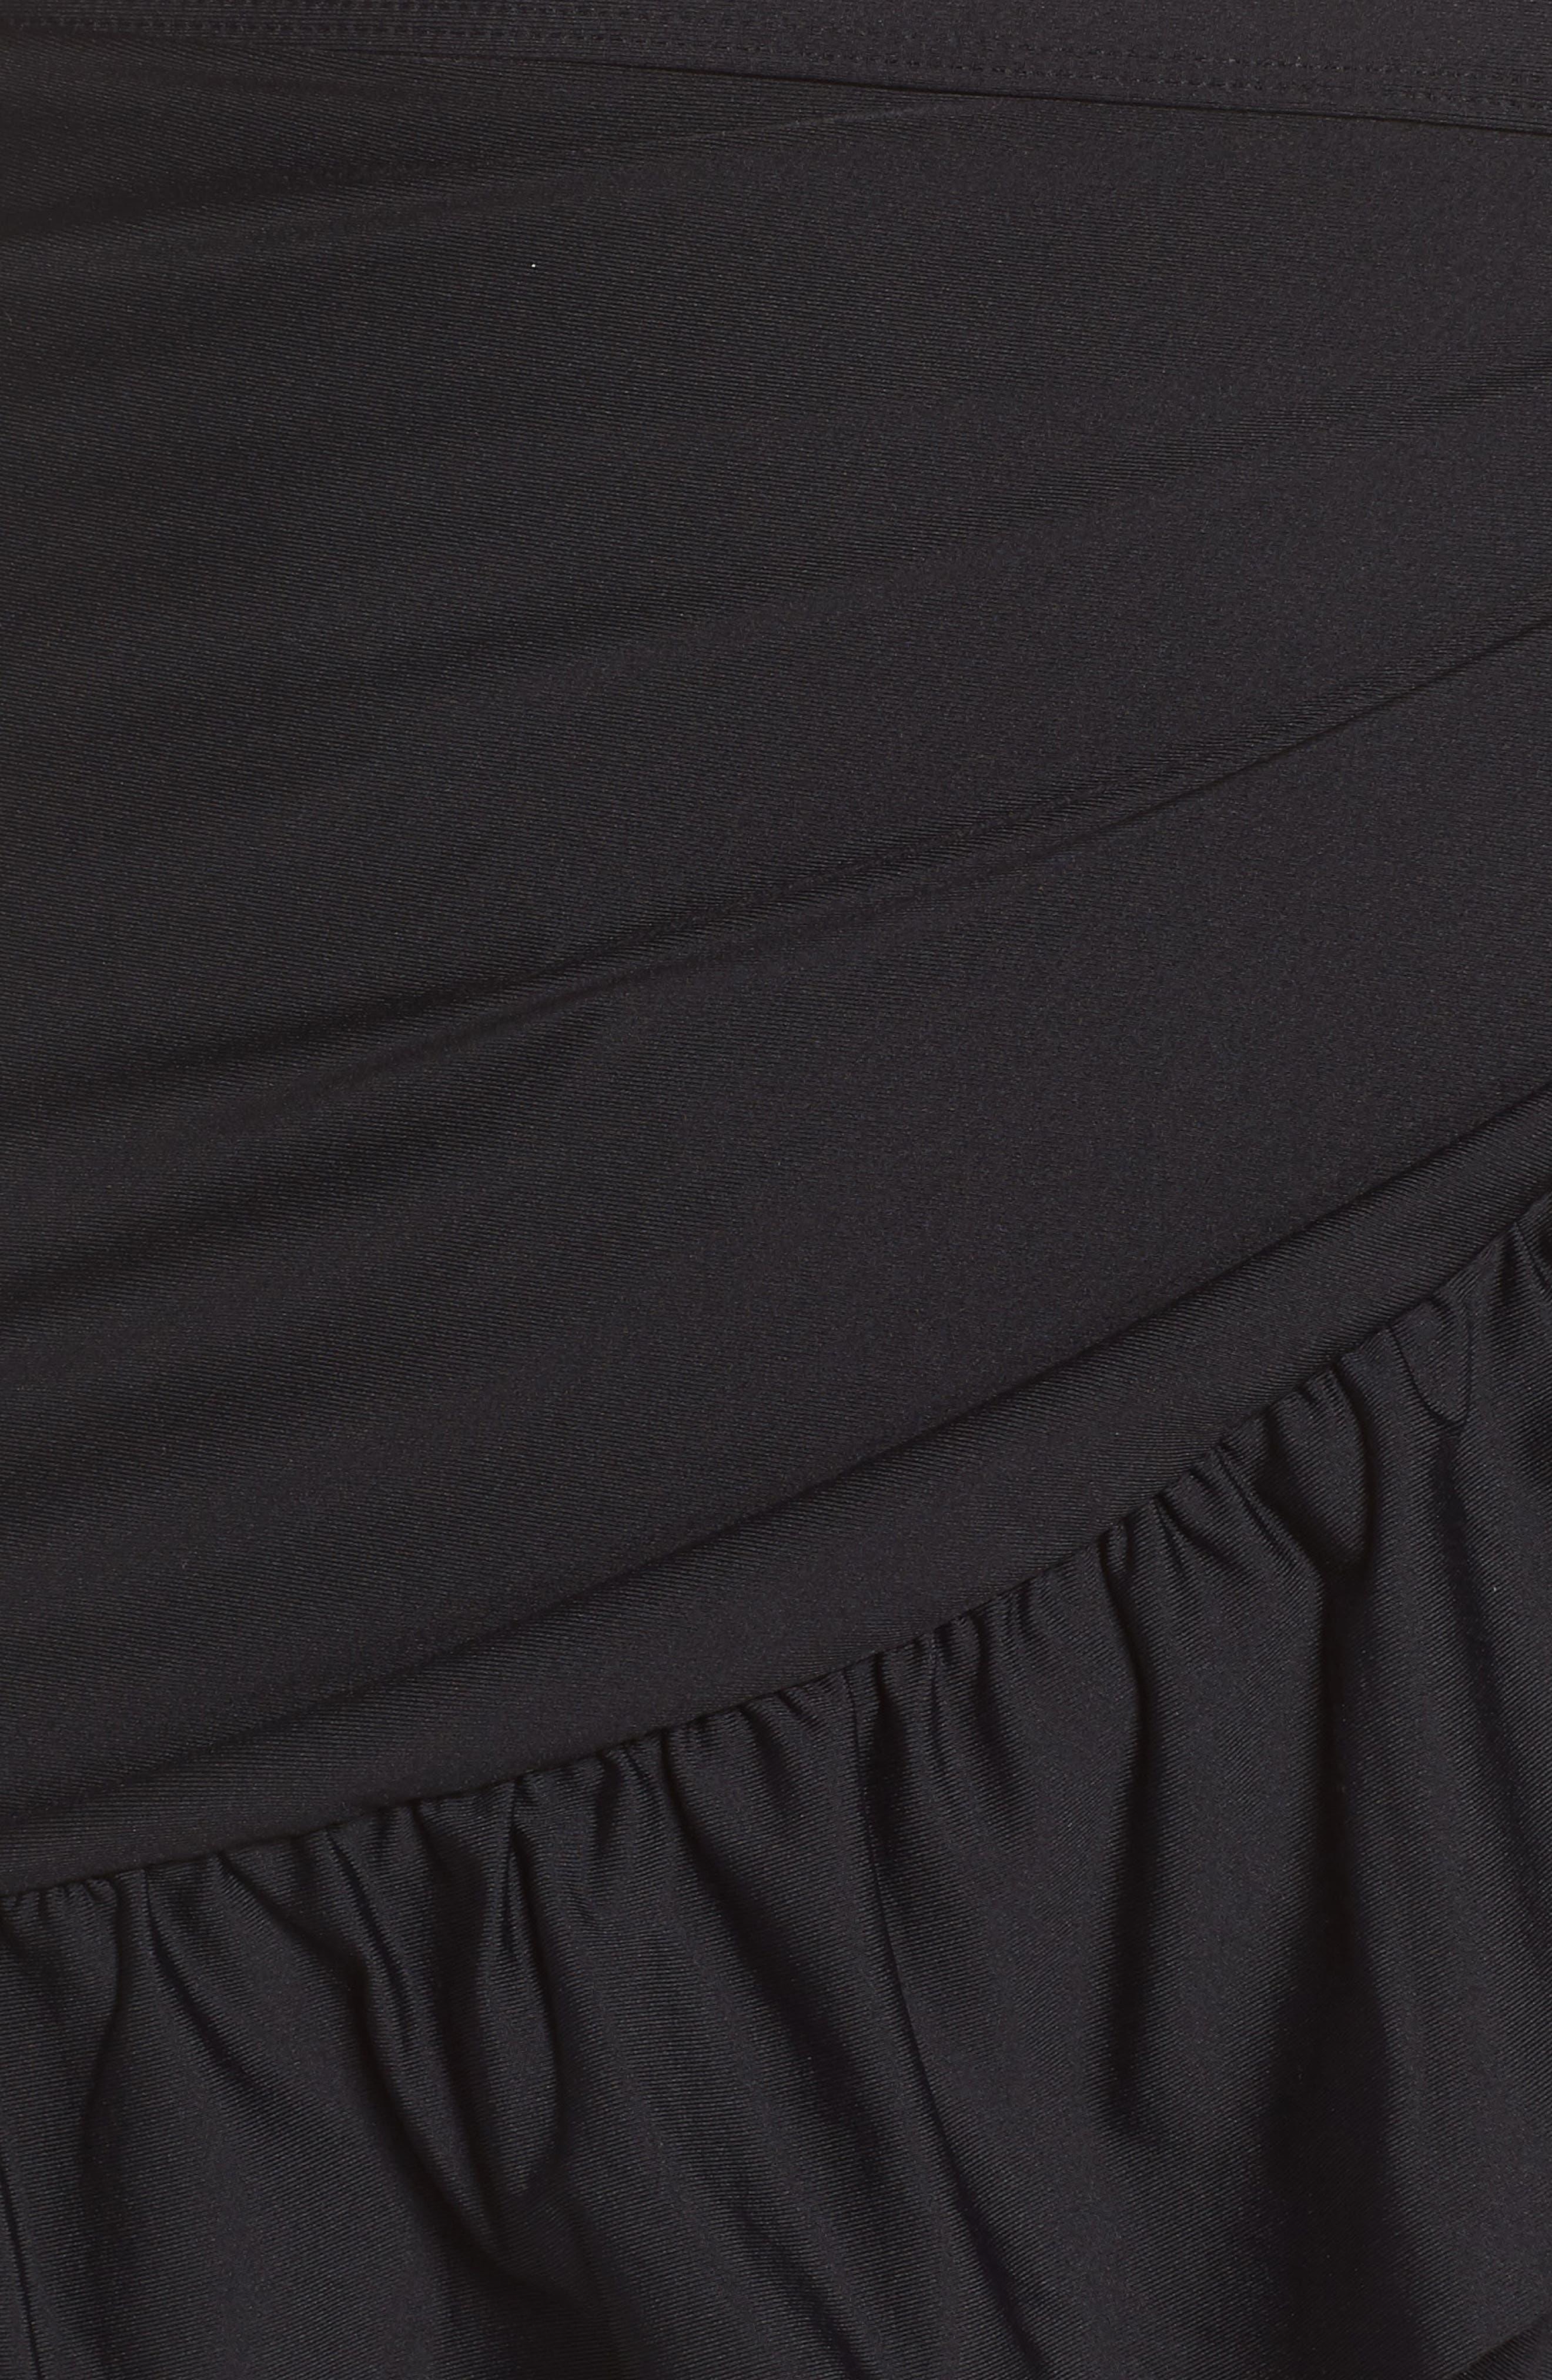 J.CREW,                             Cover-Up Wrap Skirt,                             Alternate thumbnail 5, color,                             001